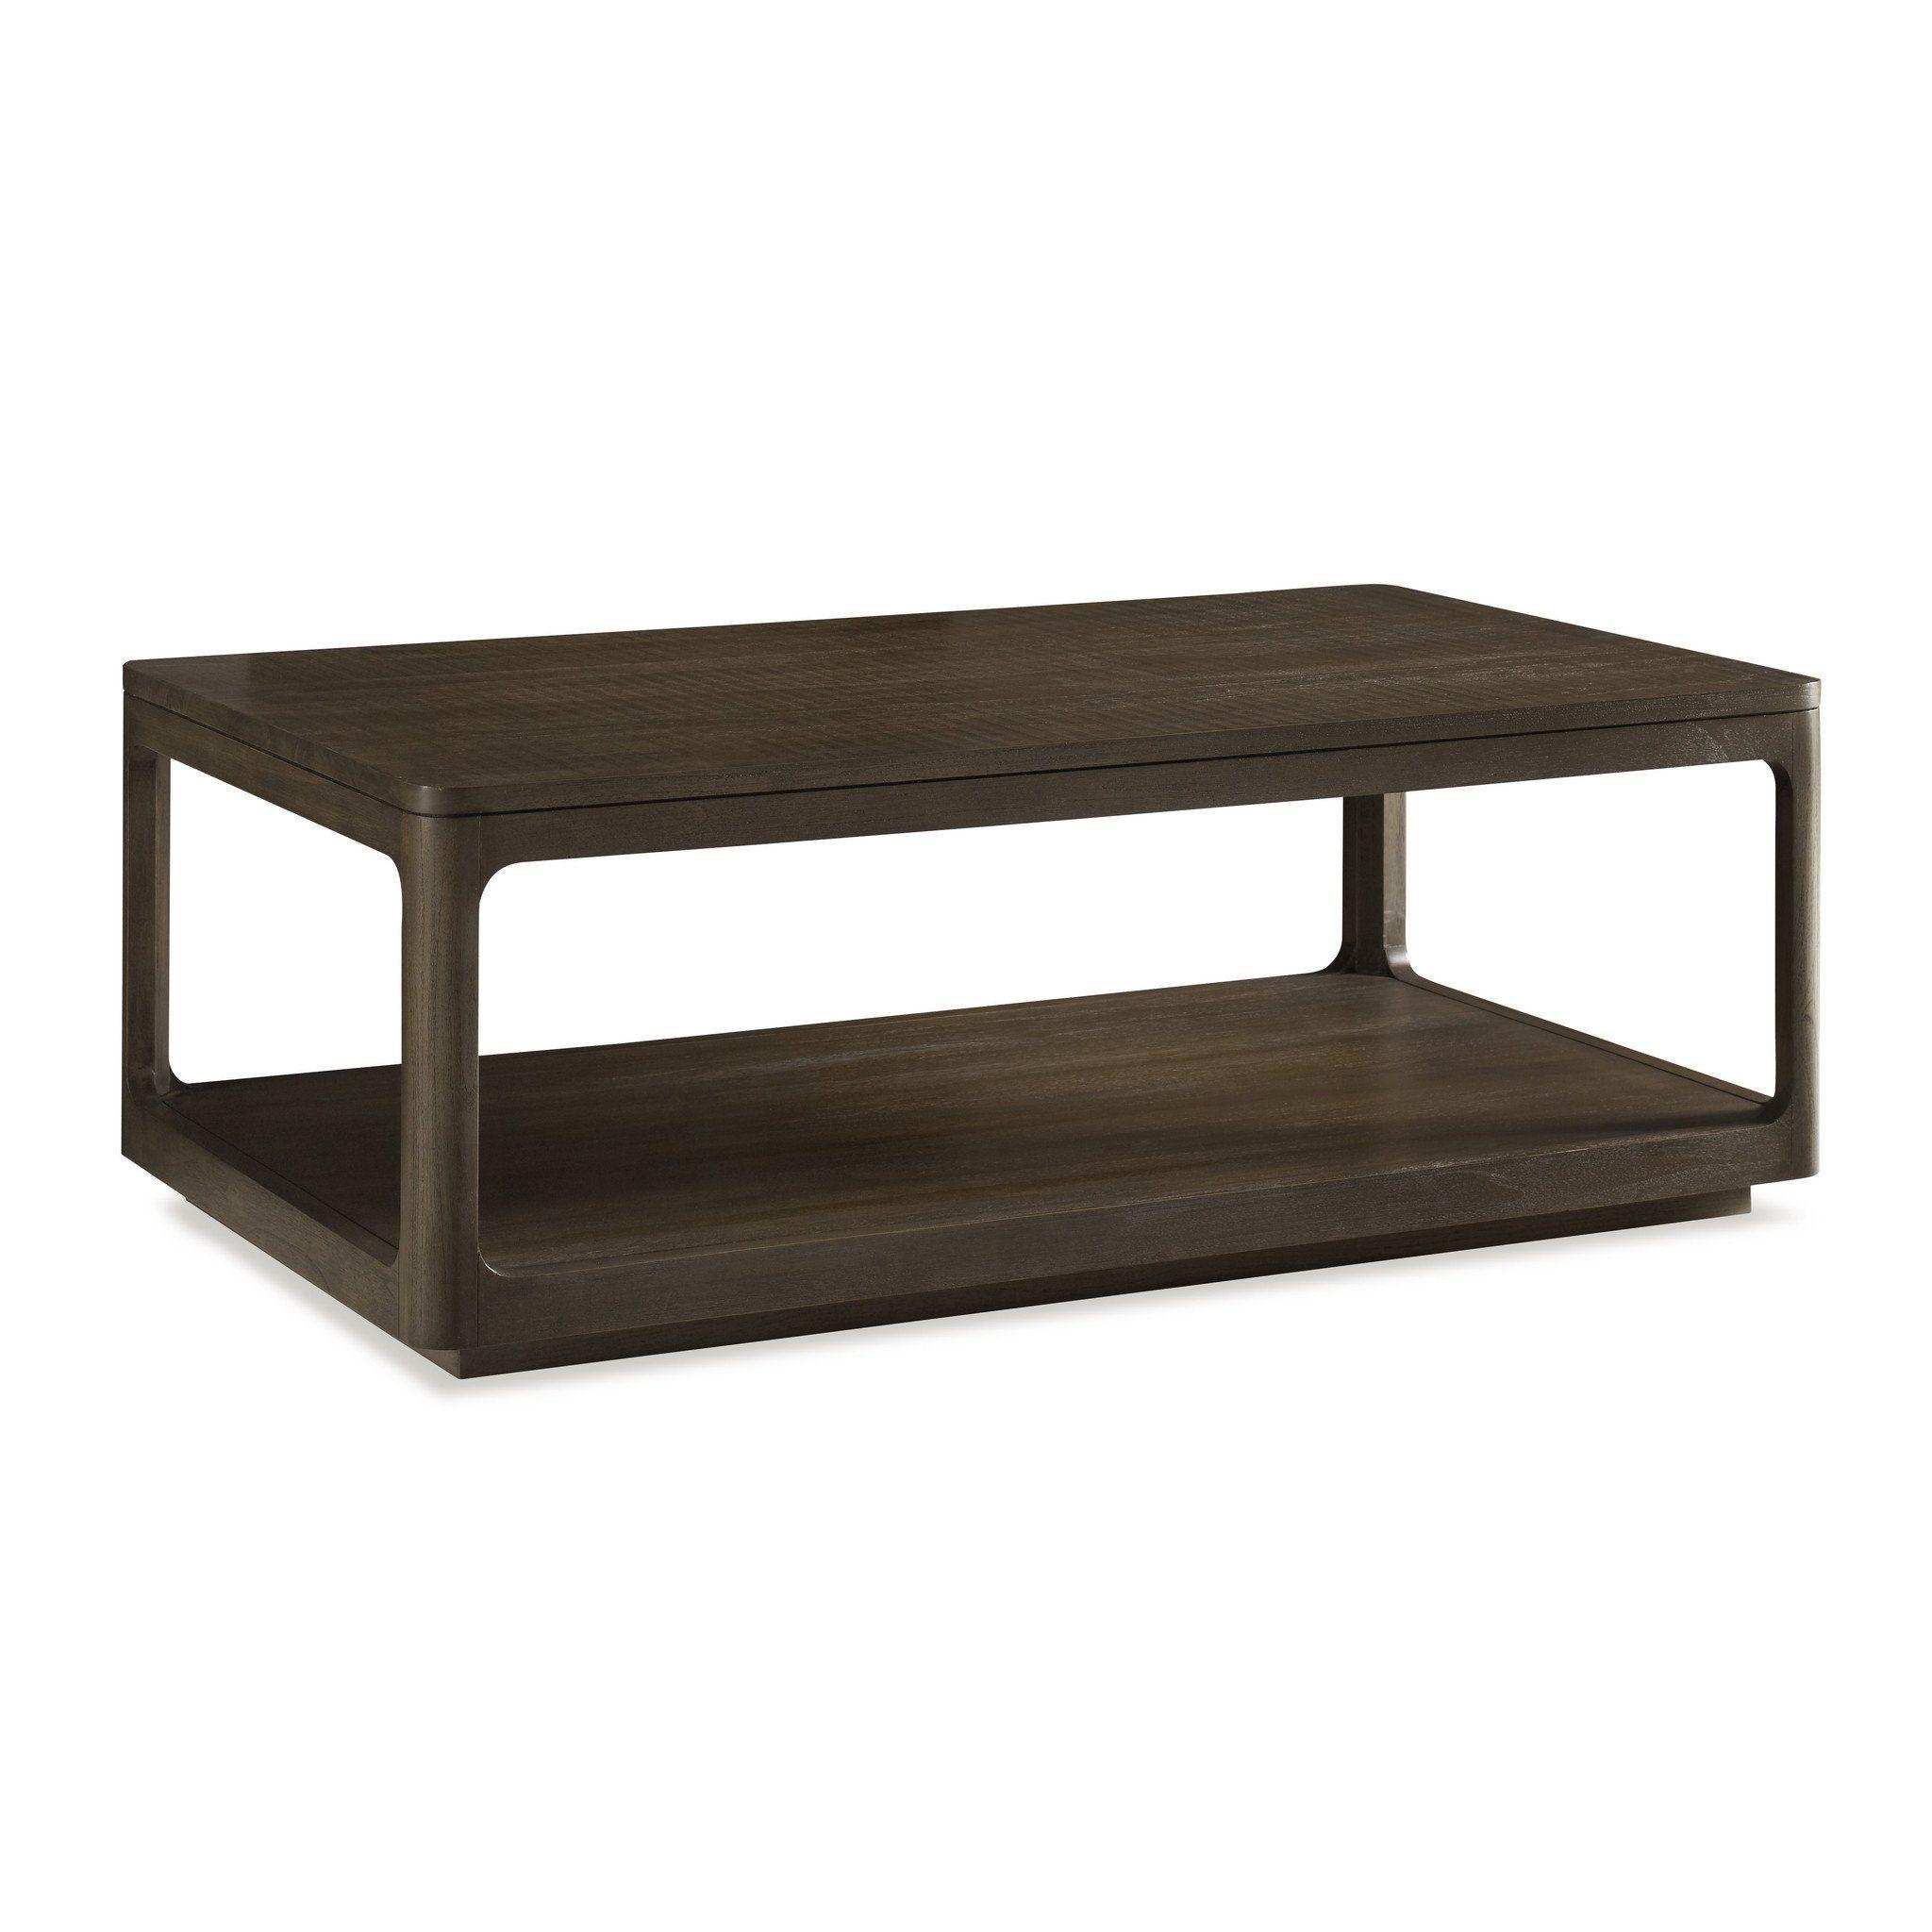 Brownstone Furniture Messina Rectangular Coffee Table Coffee Table Rectangle Coffee Table Wood Coffee Table With Storage [ 2048 x 2048 Pixel ]